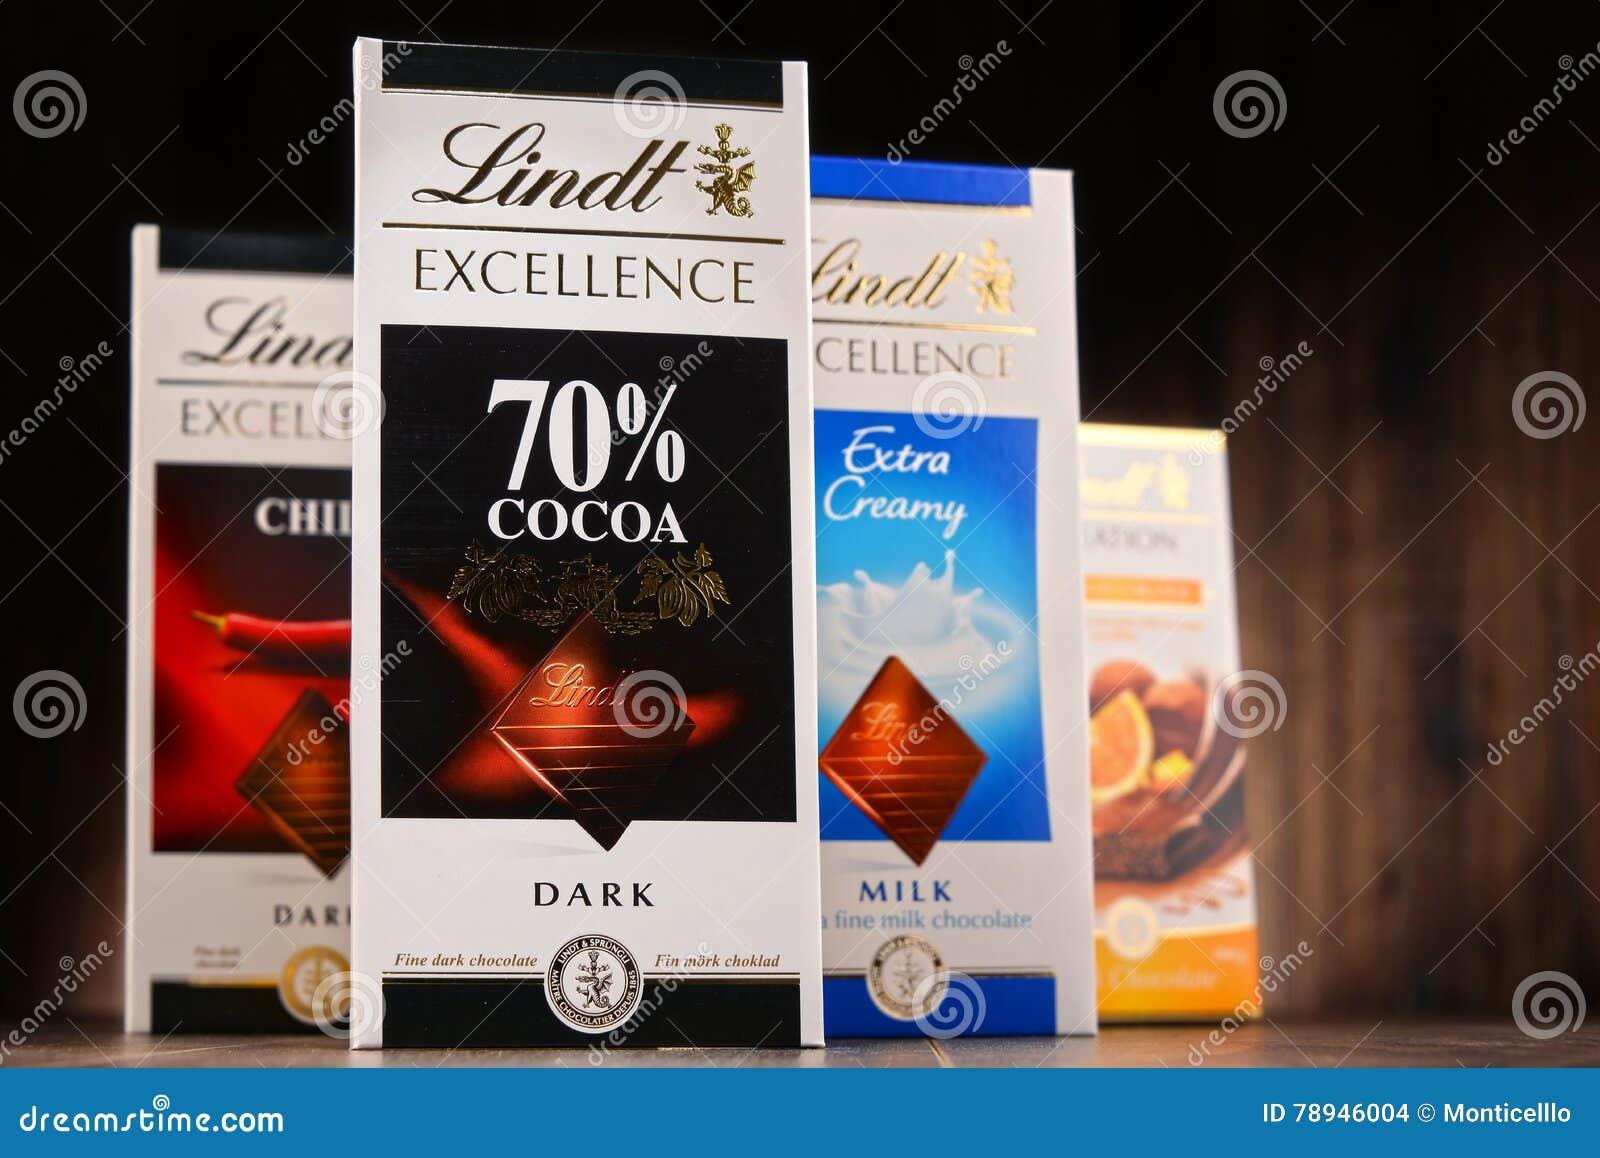 lindt choklad kokos